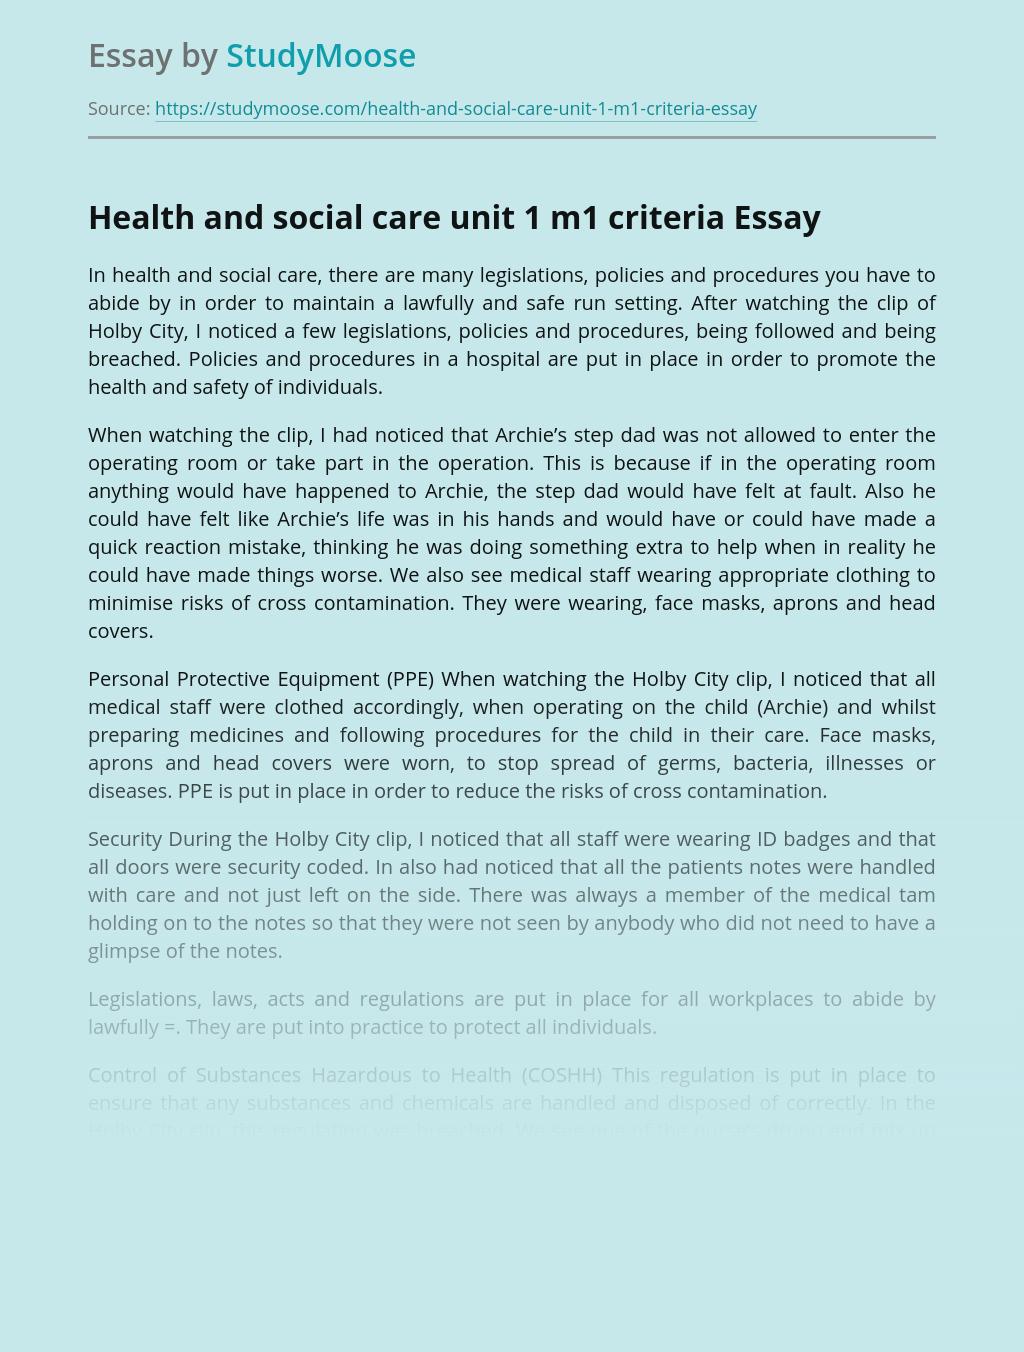 Health and social care unit 1 m1 criteria